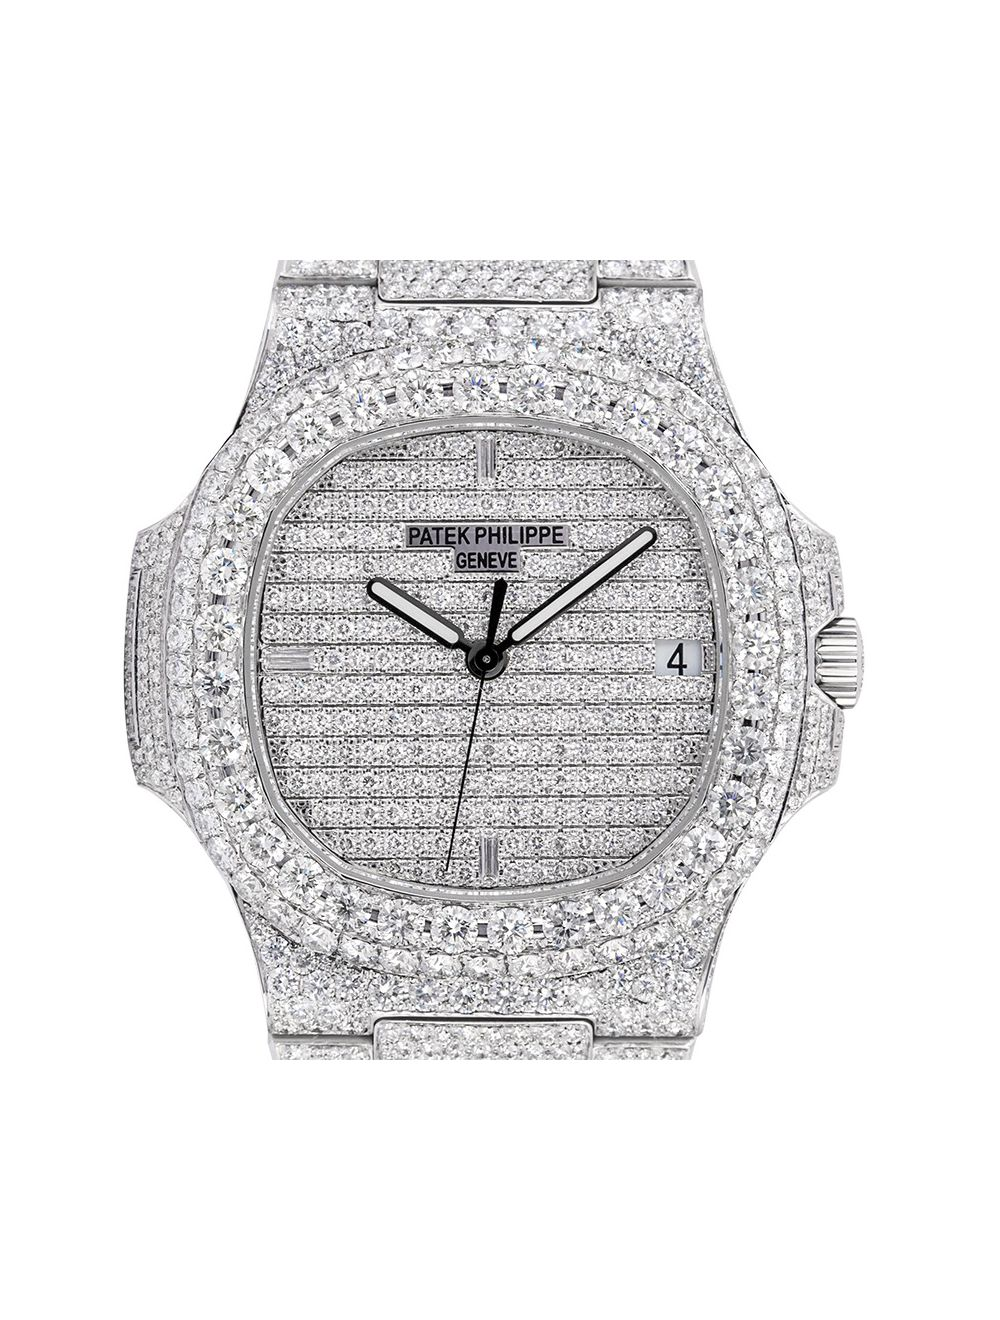 nouveau produit 24a64 79bc2 Custom Micro Diamond Set Patek Philippe Nautilus 5711